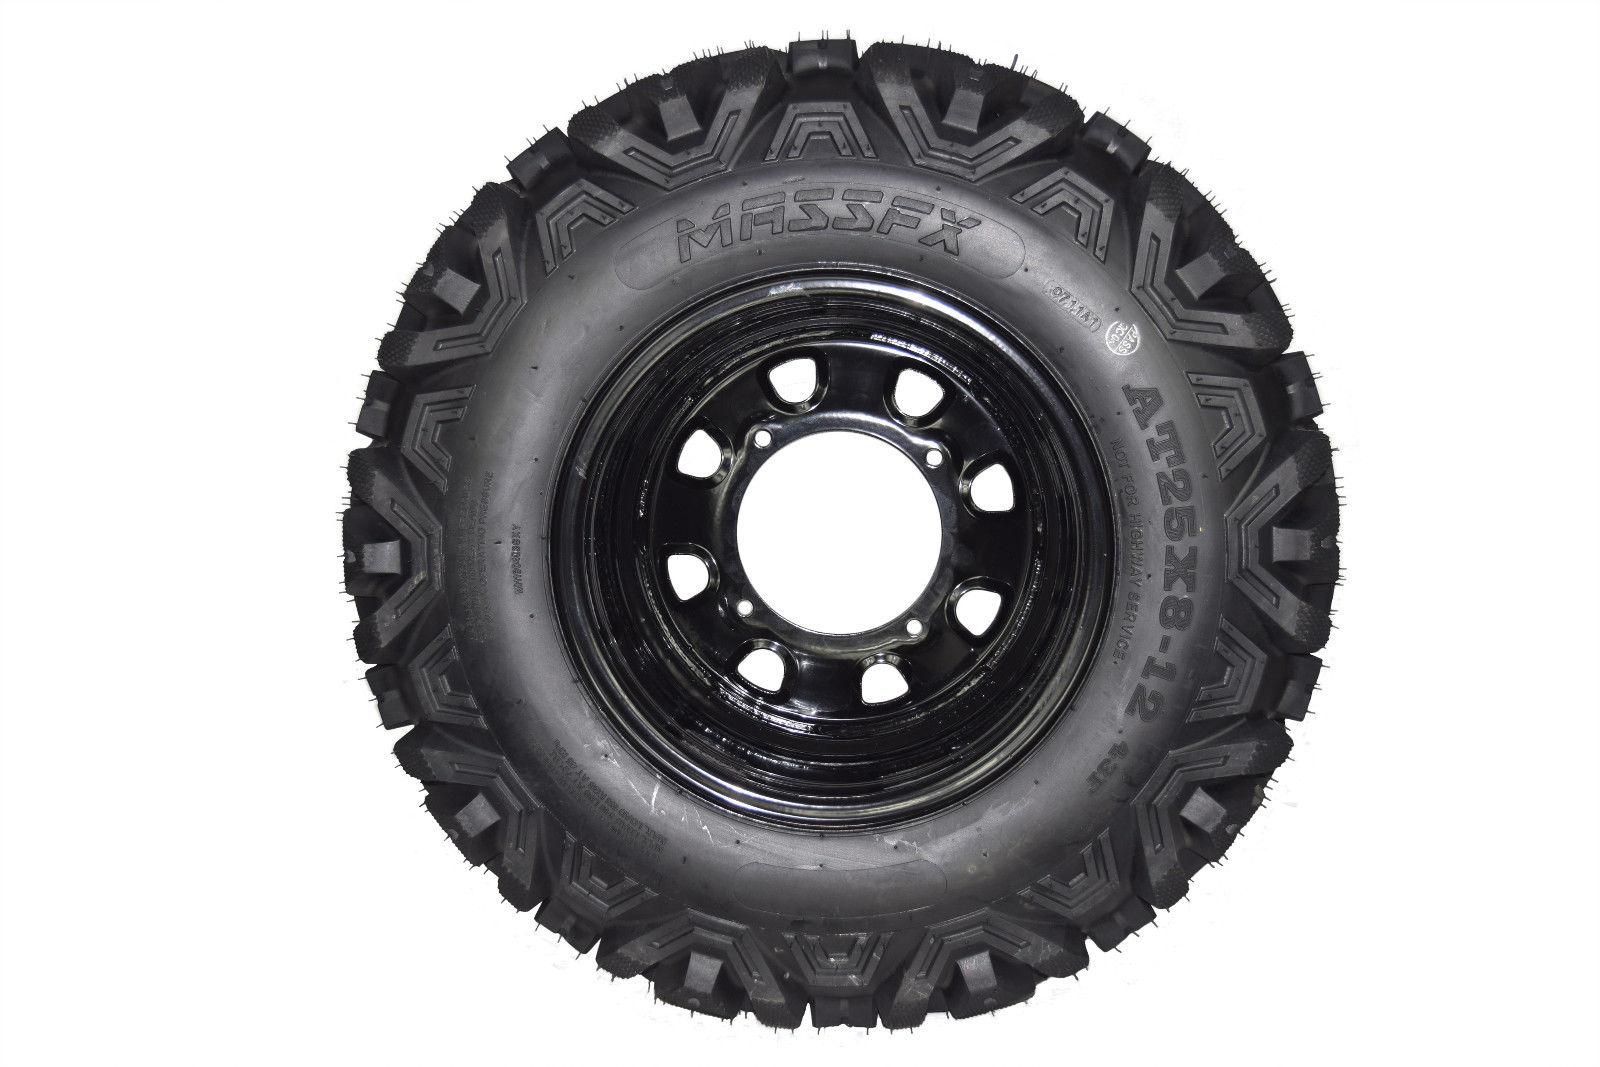 ITP Delta Steel Wheel 12x7 4//156 Gloss Black 4+3 Polaris RZR 800 2008-2014